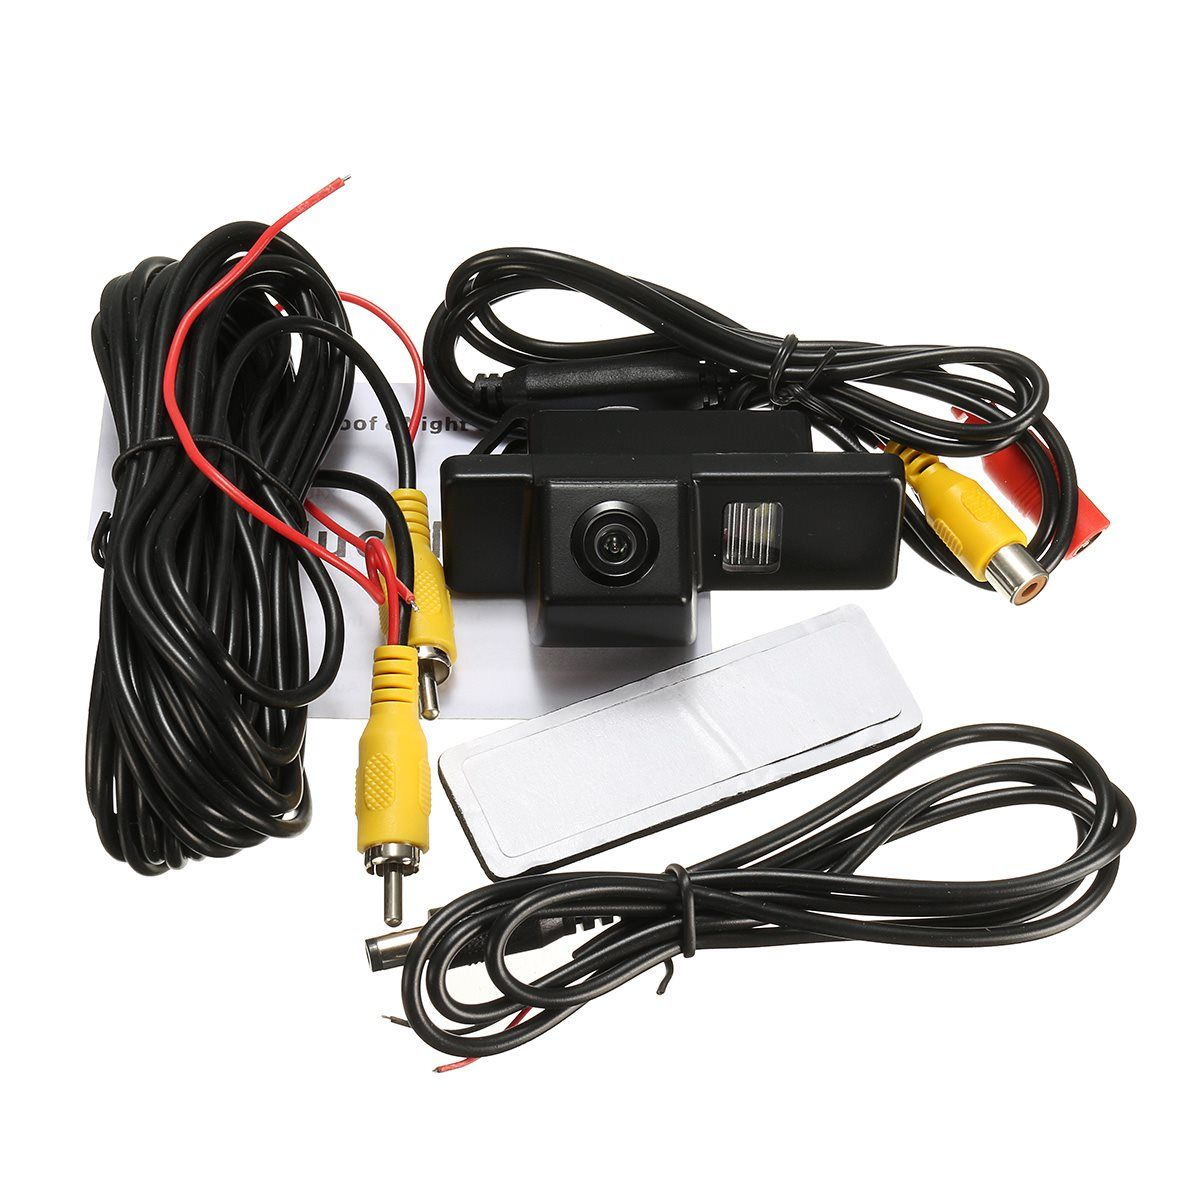 Hd Waterproof Reversing Rear View License Plate Camera For Nissan Pathfinder Dvd Wiring